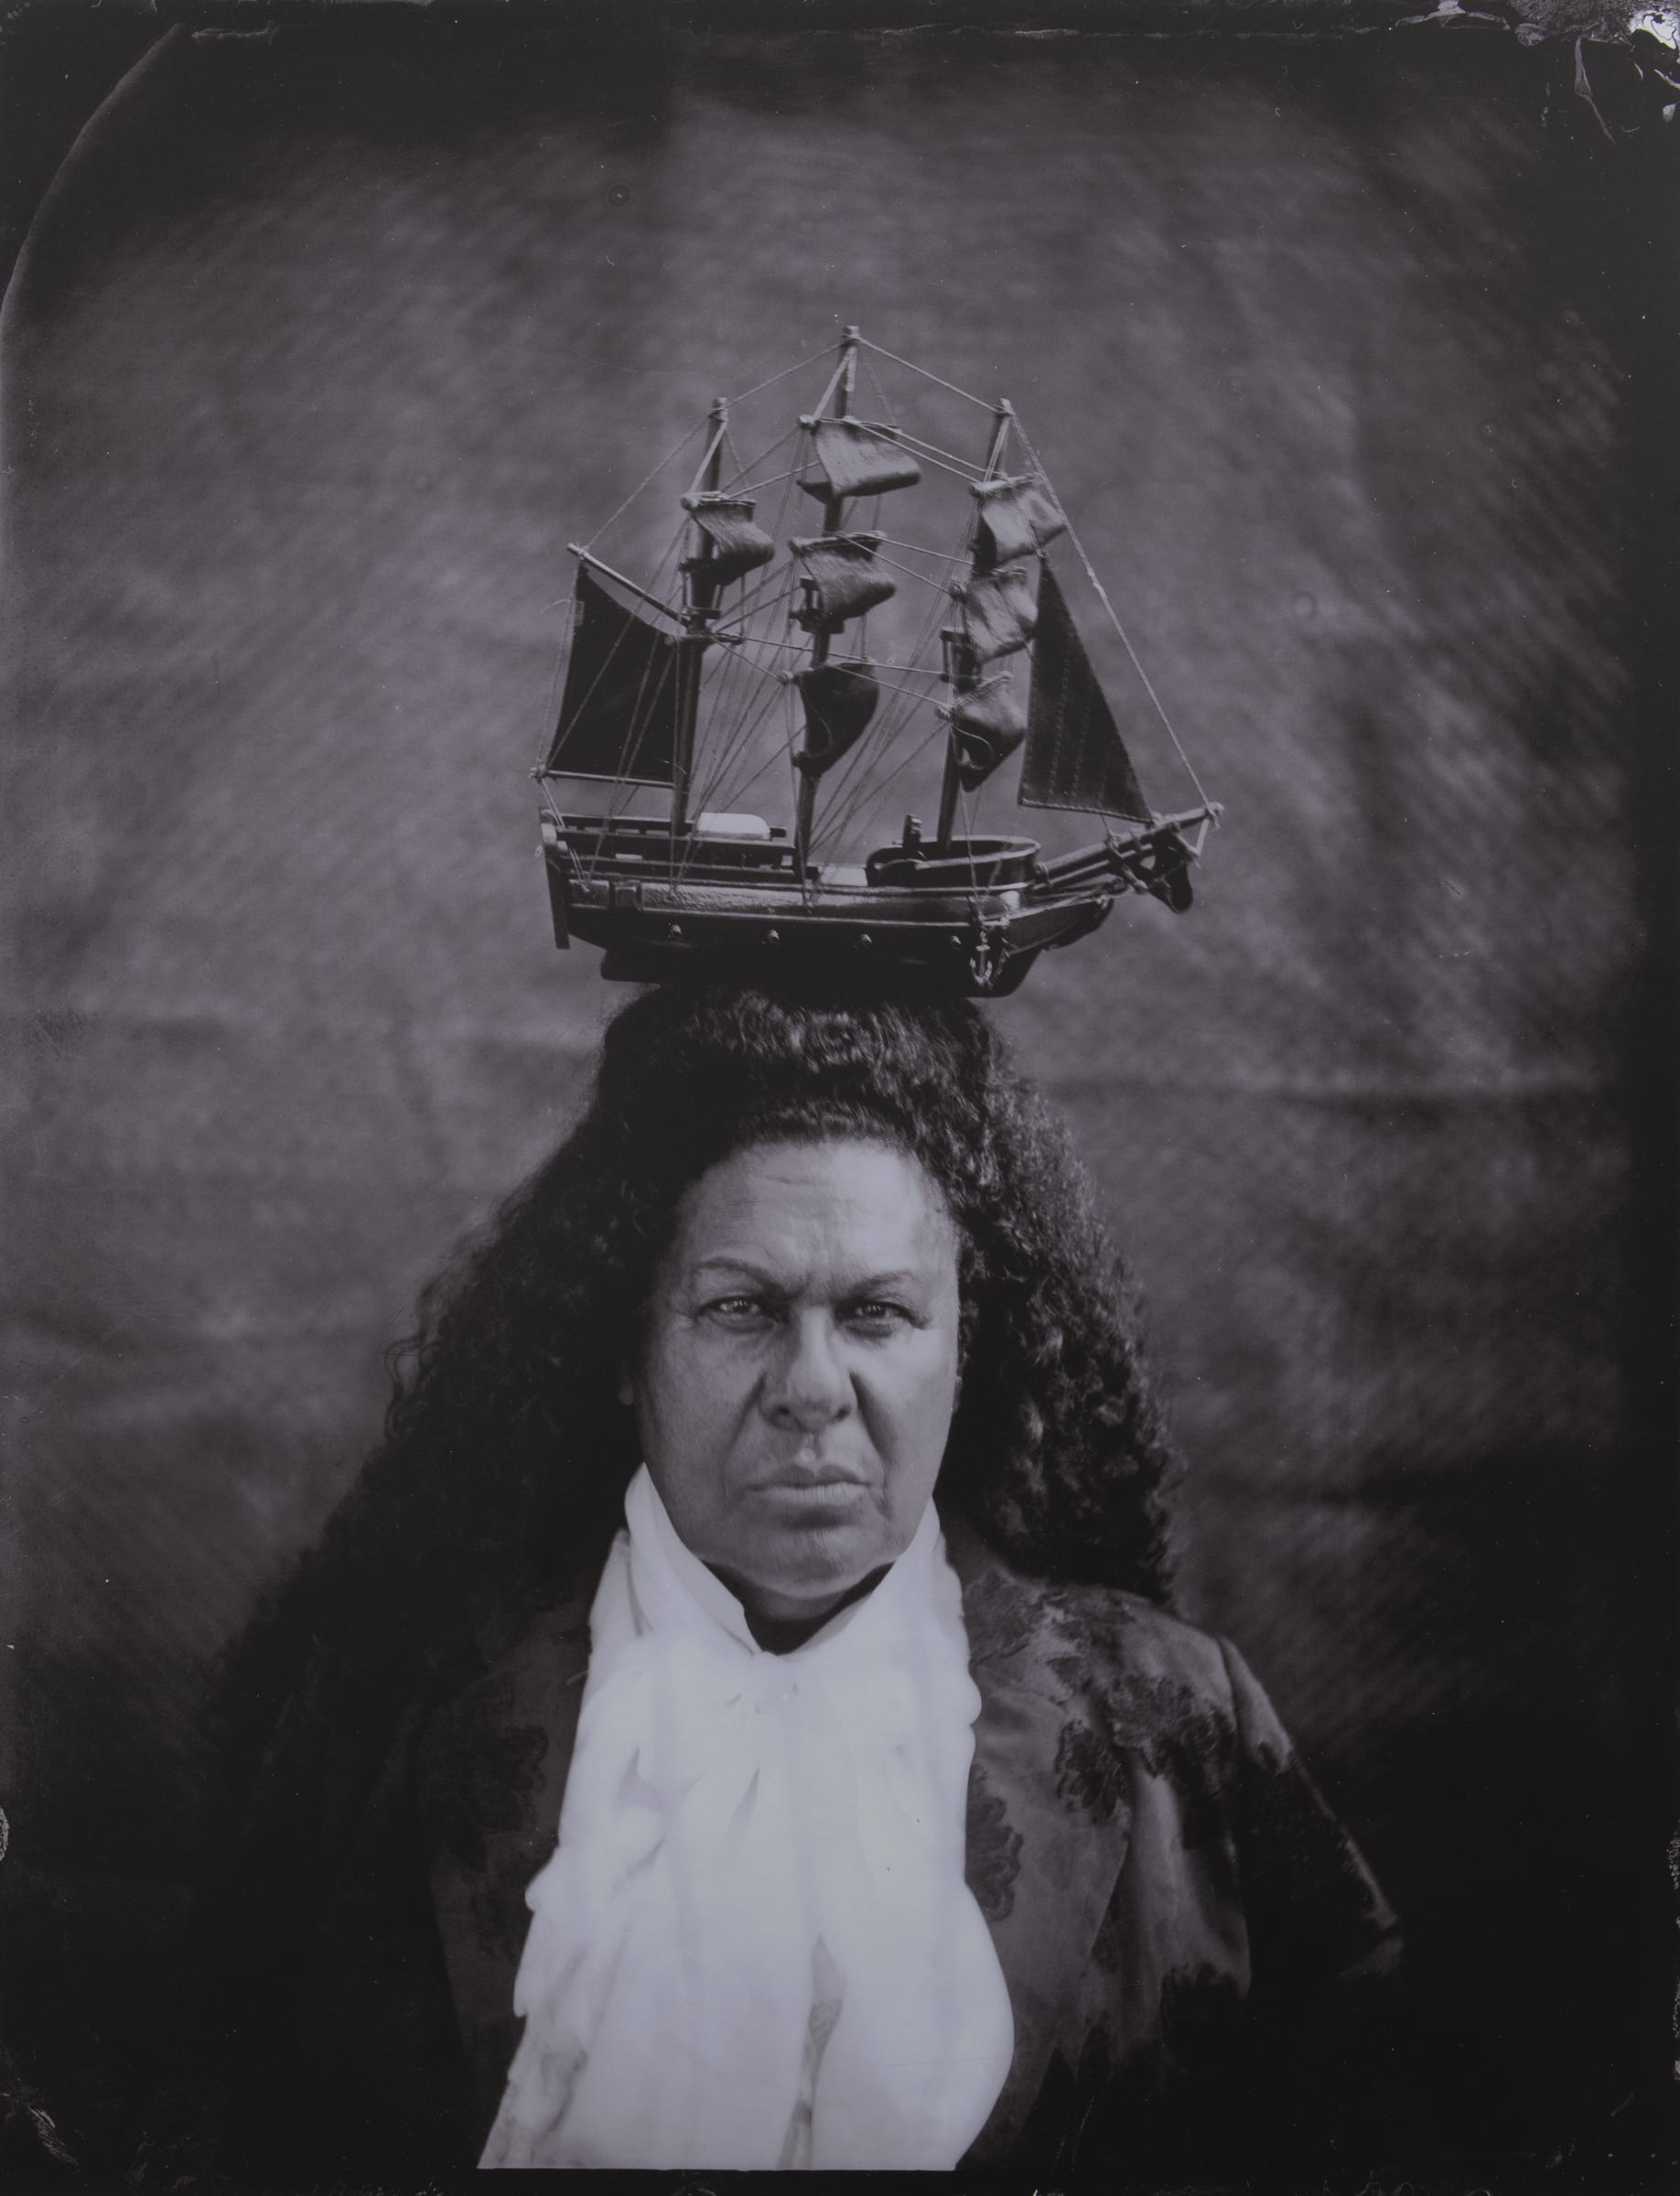 "<span class=""link fancybox-details-link""><a href=""/artists/63-jasmine-togo-brisby/works/8004-jasmine-togo-brisby-post-plantation-heir-i-2019/"">View Detail Page</a></span><div class=""artist""><strong>Jasmine Togo-Brisby</strong></div> <div class=""title""><em>Post Plantation Heir I</em>, 2019</div> <div class=""medium"">Unique photographic print on dibond</div> <div class=""dimensions"">1285mm x 985mm</div>"